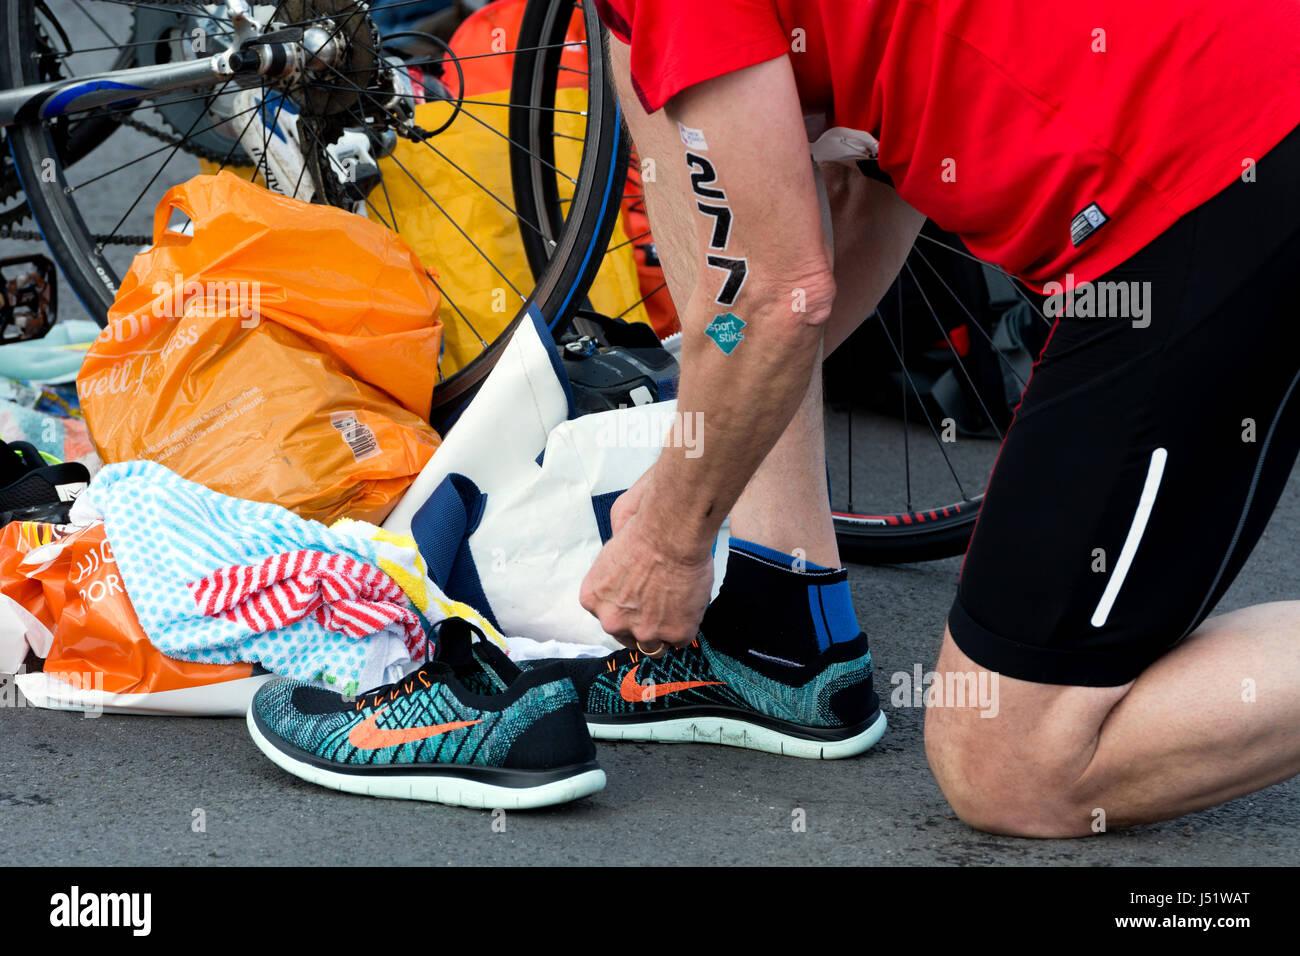 Concurrent De Masculin Chaussures CourseZone Nike Mettre Sur PNy8wvmn0O